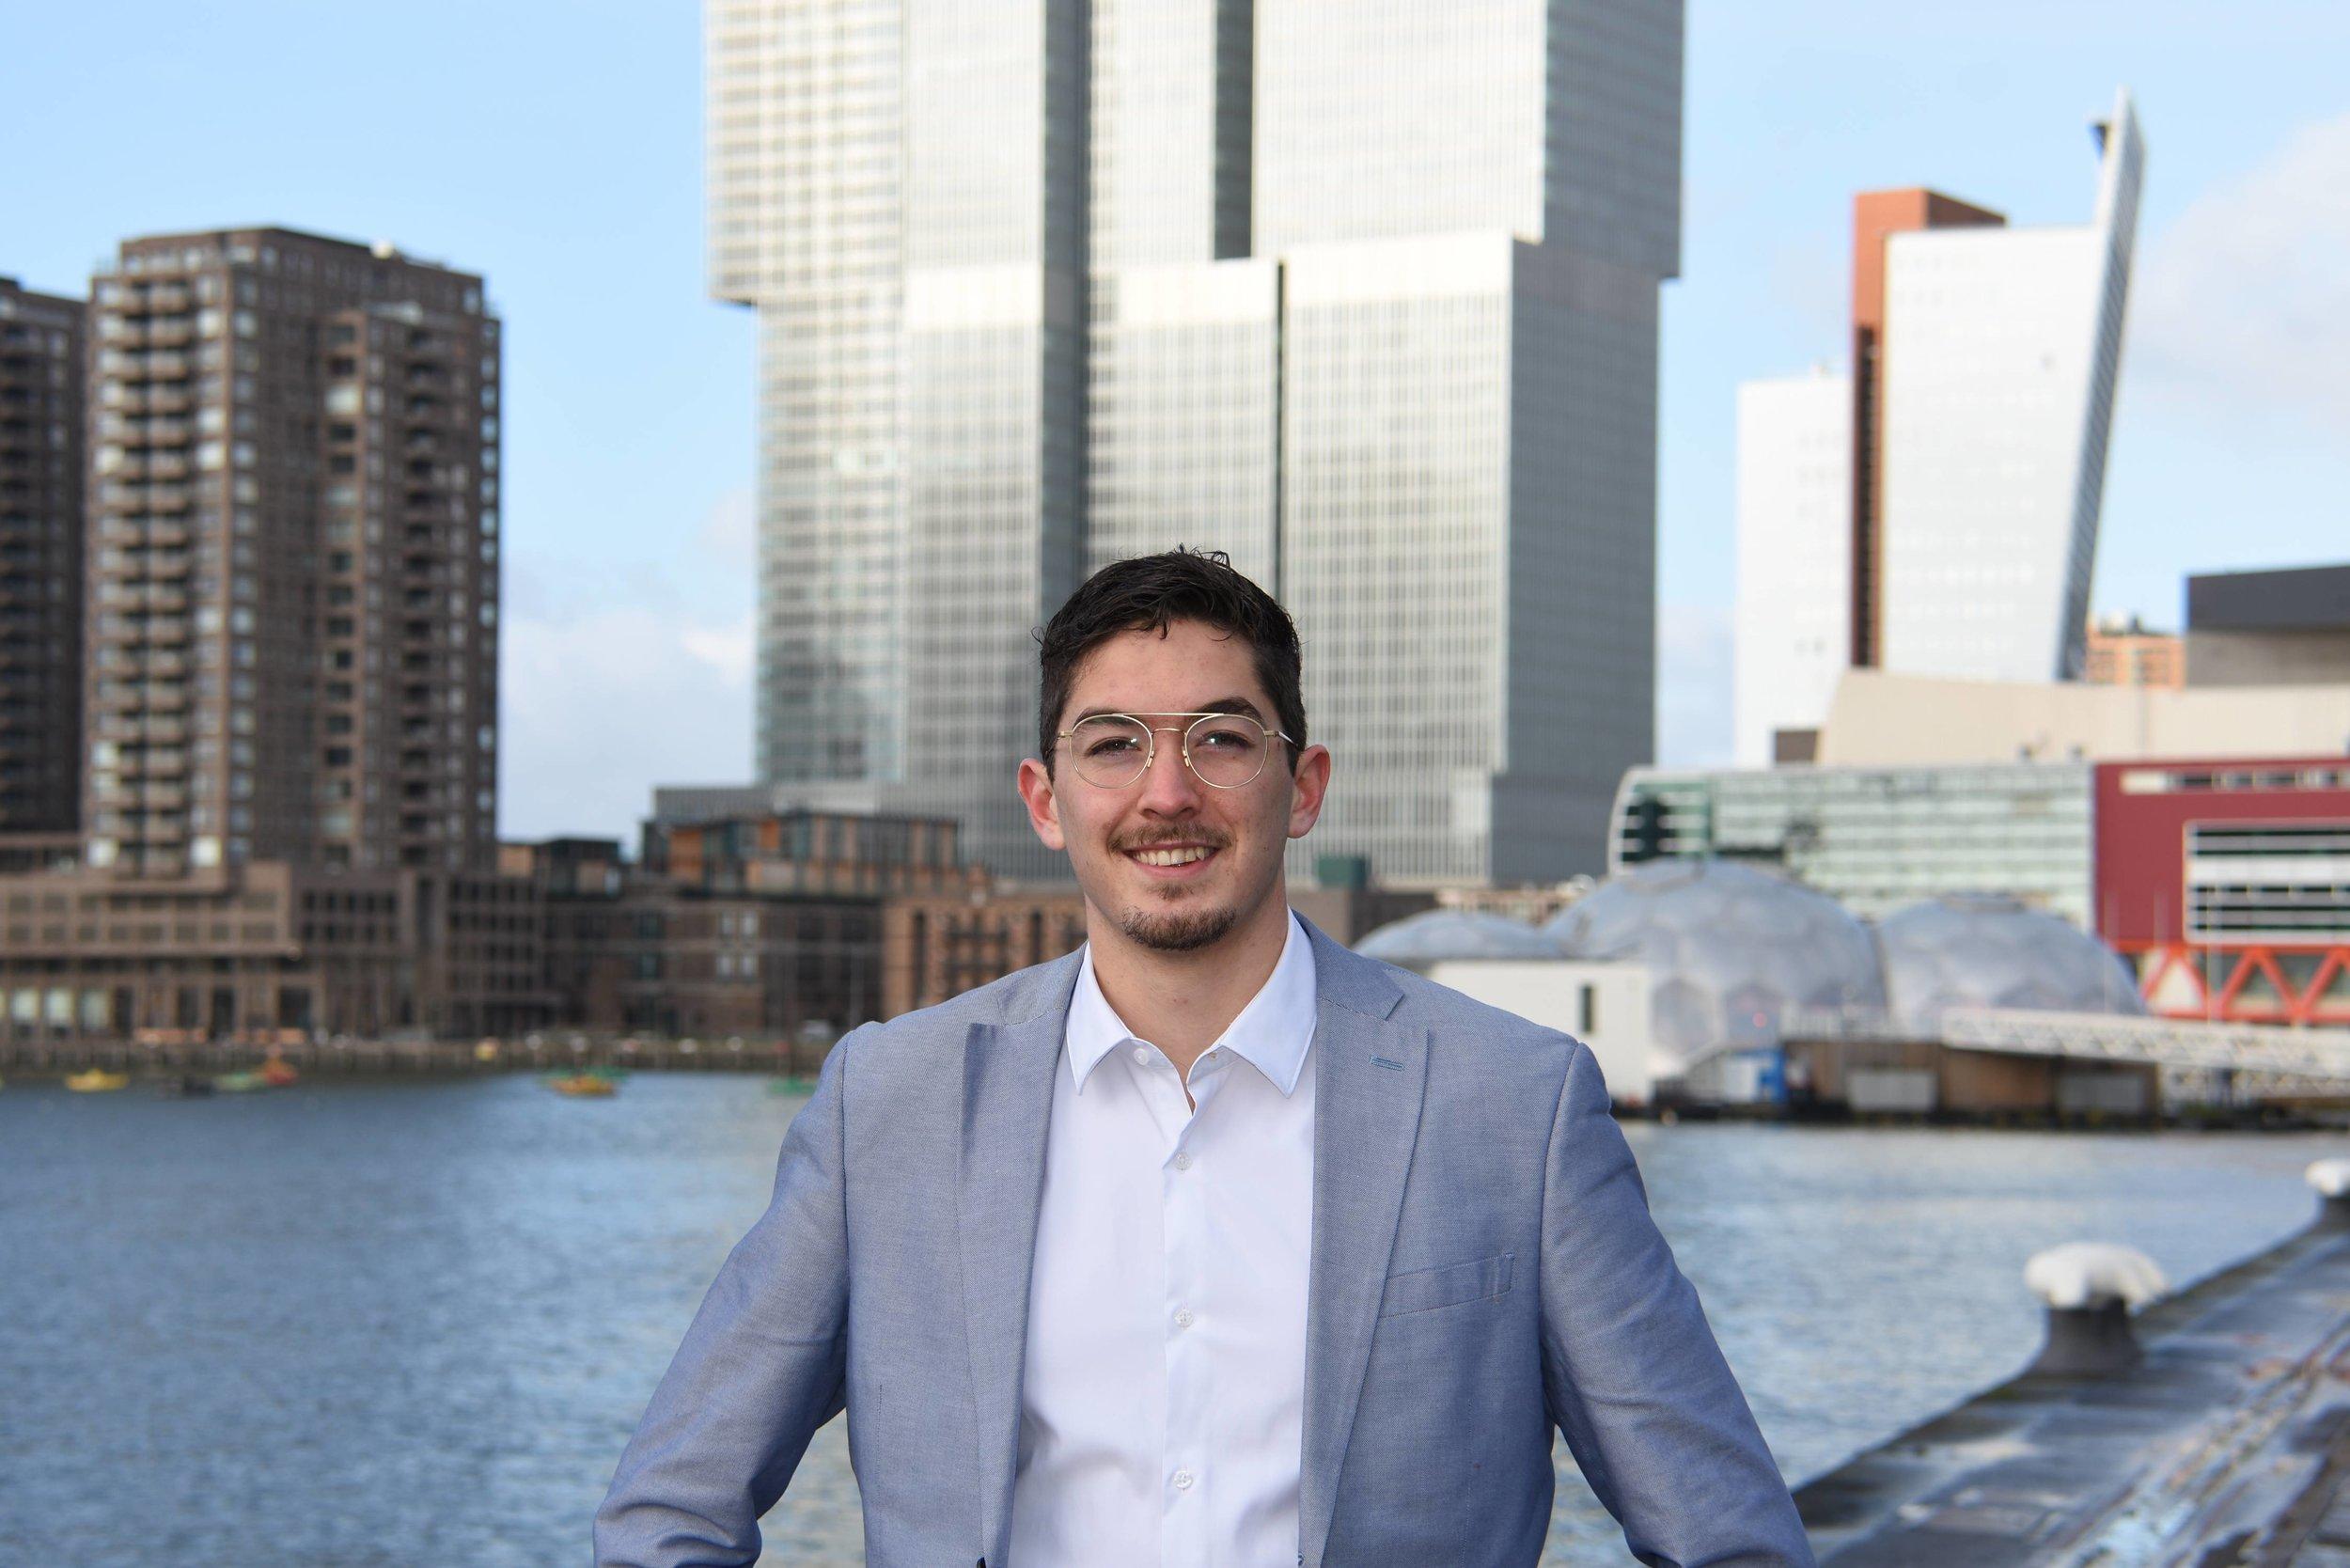 Sebastian Marmolejo - Financial manager September 2018 - January 2019CEO manager January 2019 - June 2019